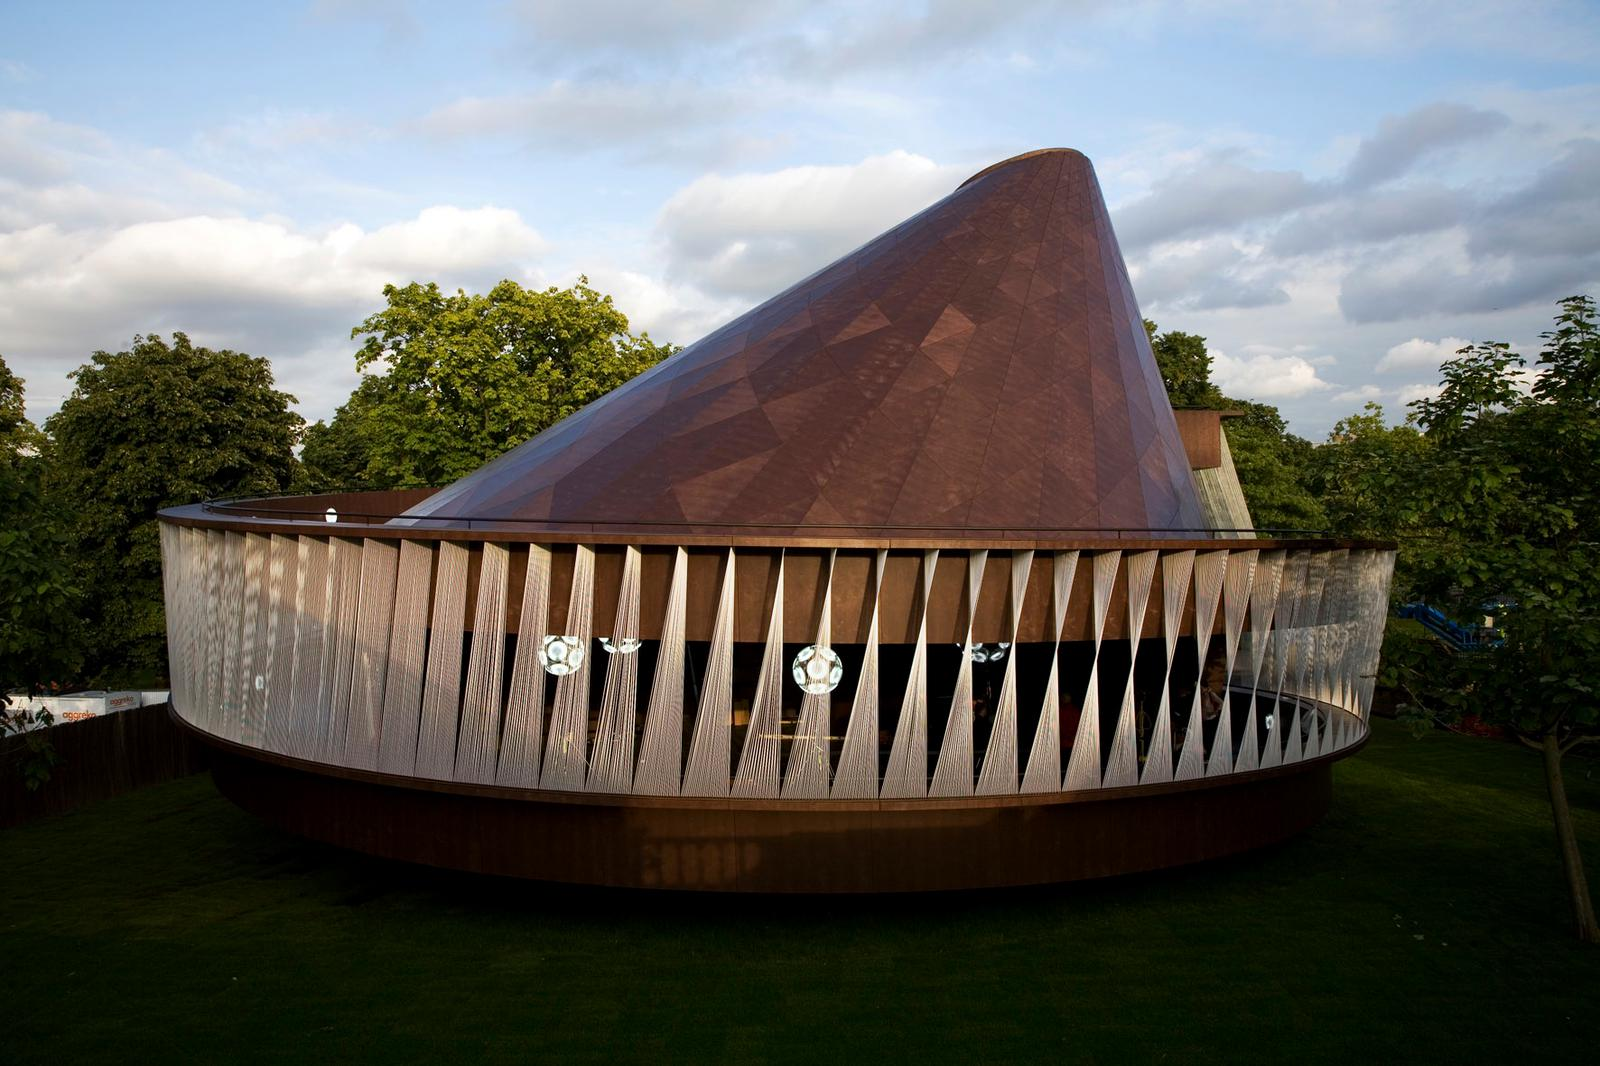 Image 11 of 34 | Serpentine Gallery Pavilion 2007 by Olafur Eliasson and Kjetil Thorsen